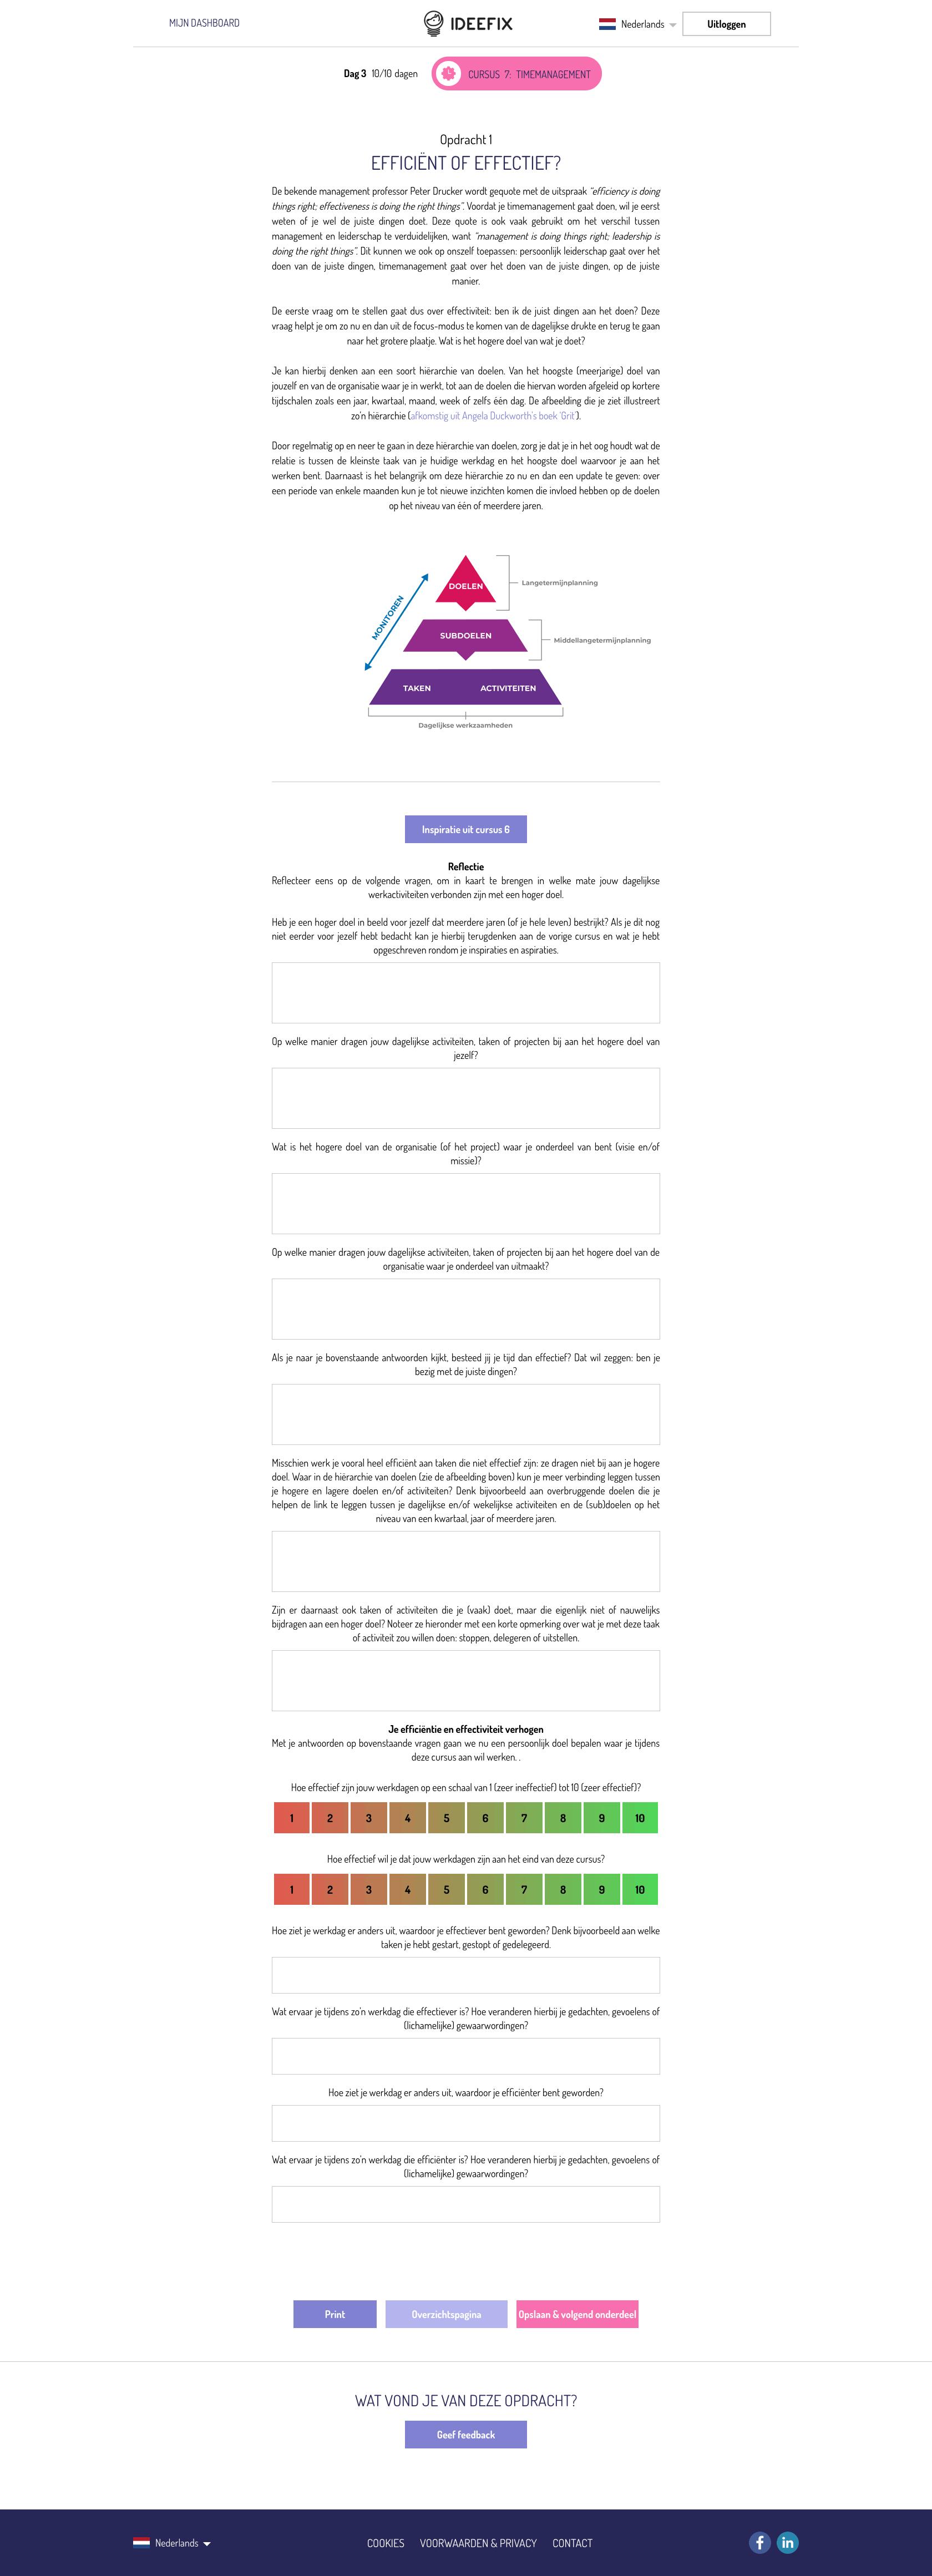 https://ideefix-cdn.s3.eu-central-1.amazonaws.com/module_screenshot/CRJhTsTGHcm2WKXPfoyK_picture.png